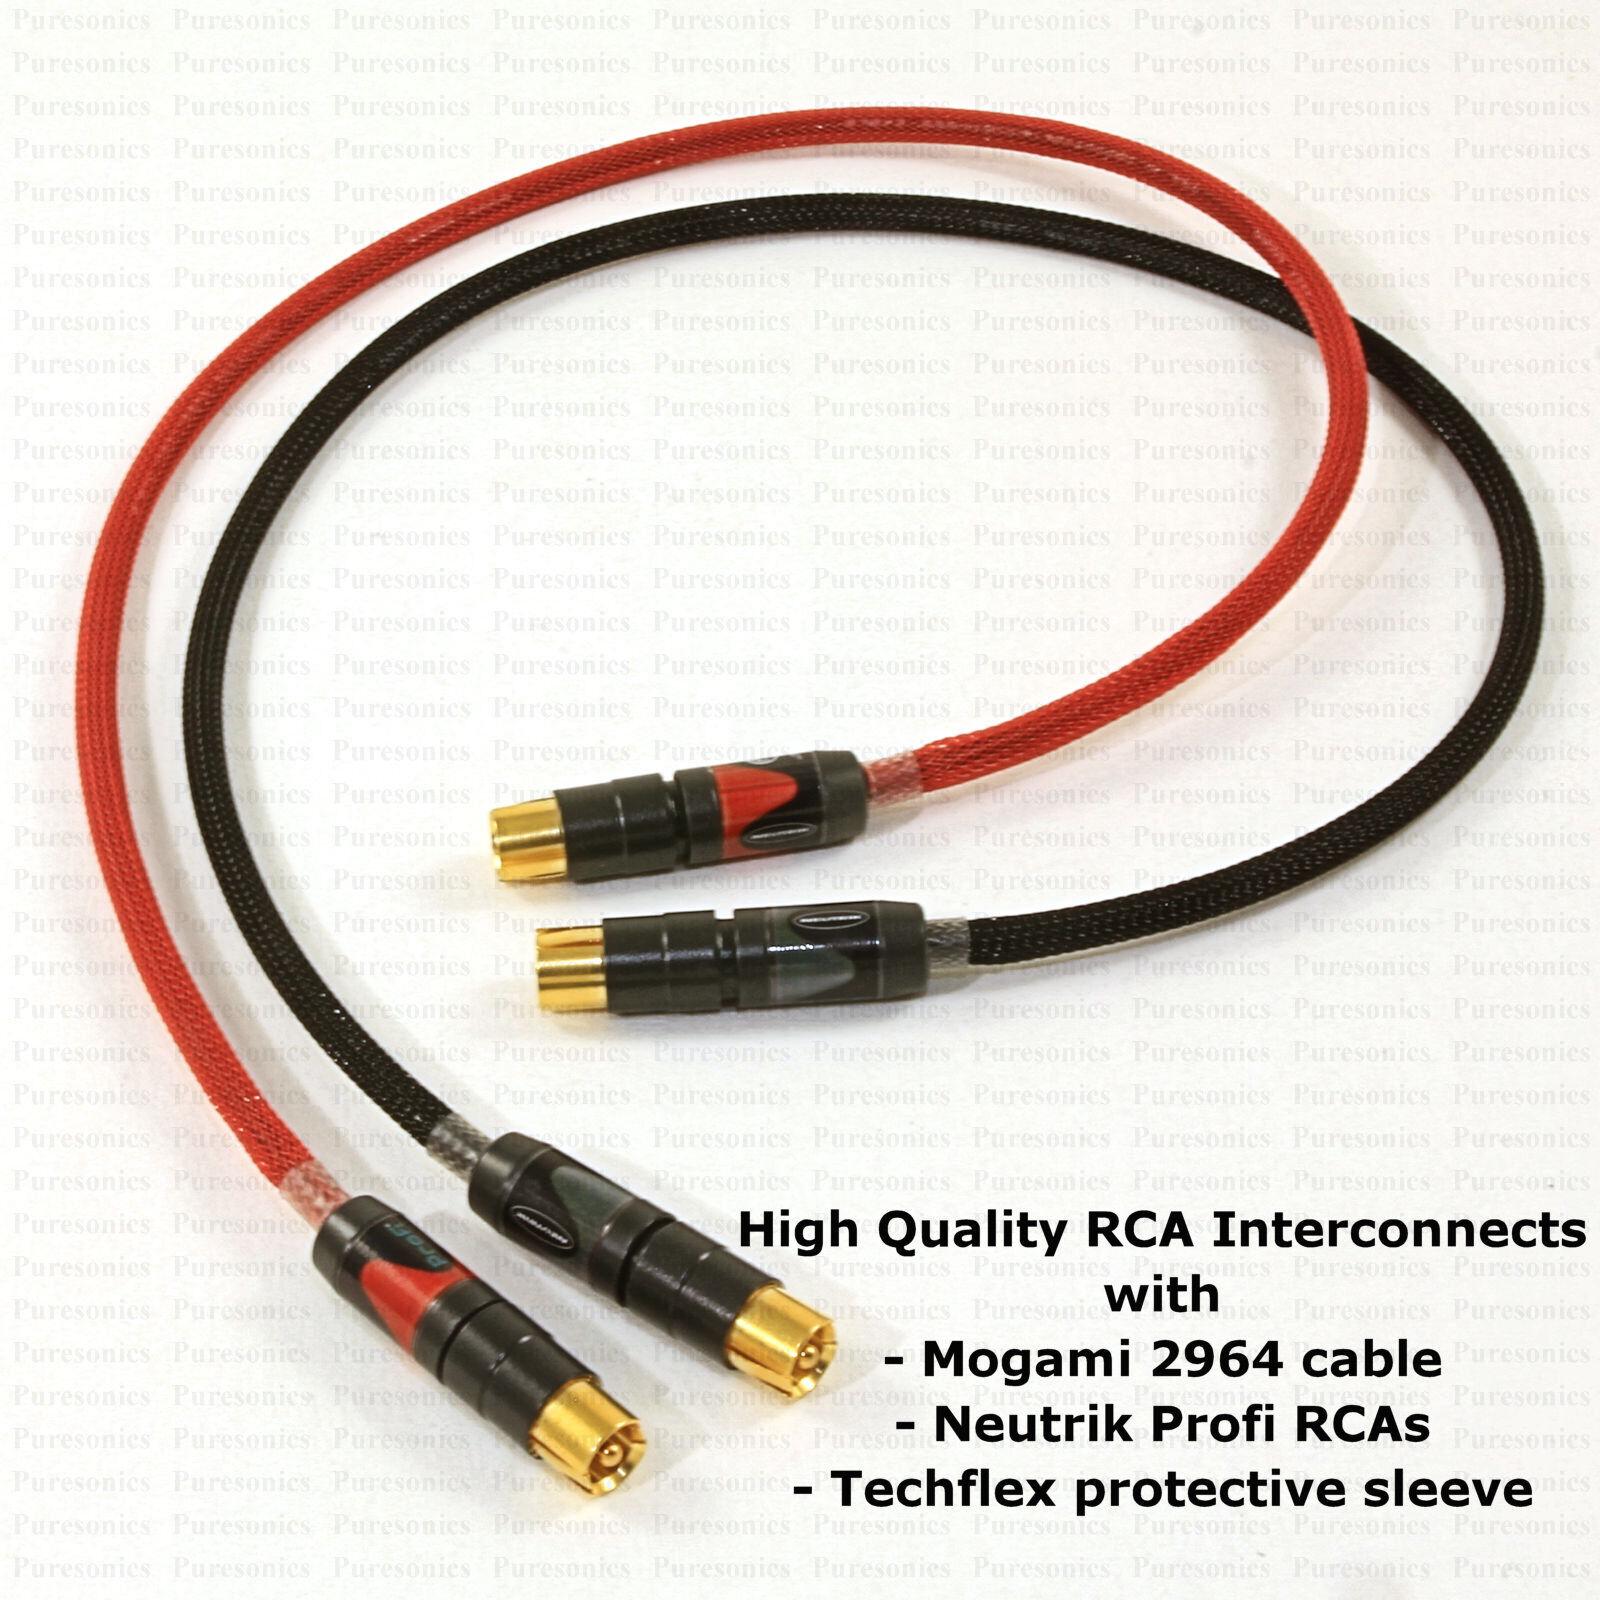 MOGAMI 2964 RCA INTERCONNECTS W  NEUTRIK 'PROFI' CONNECTORS & TECHFLEX SLEEVING